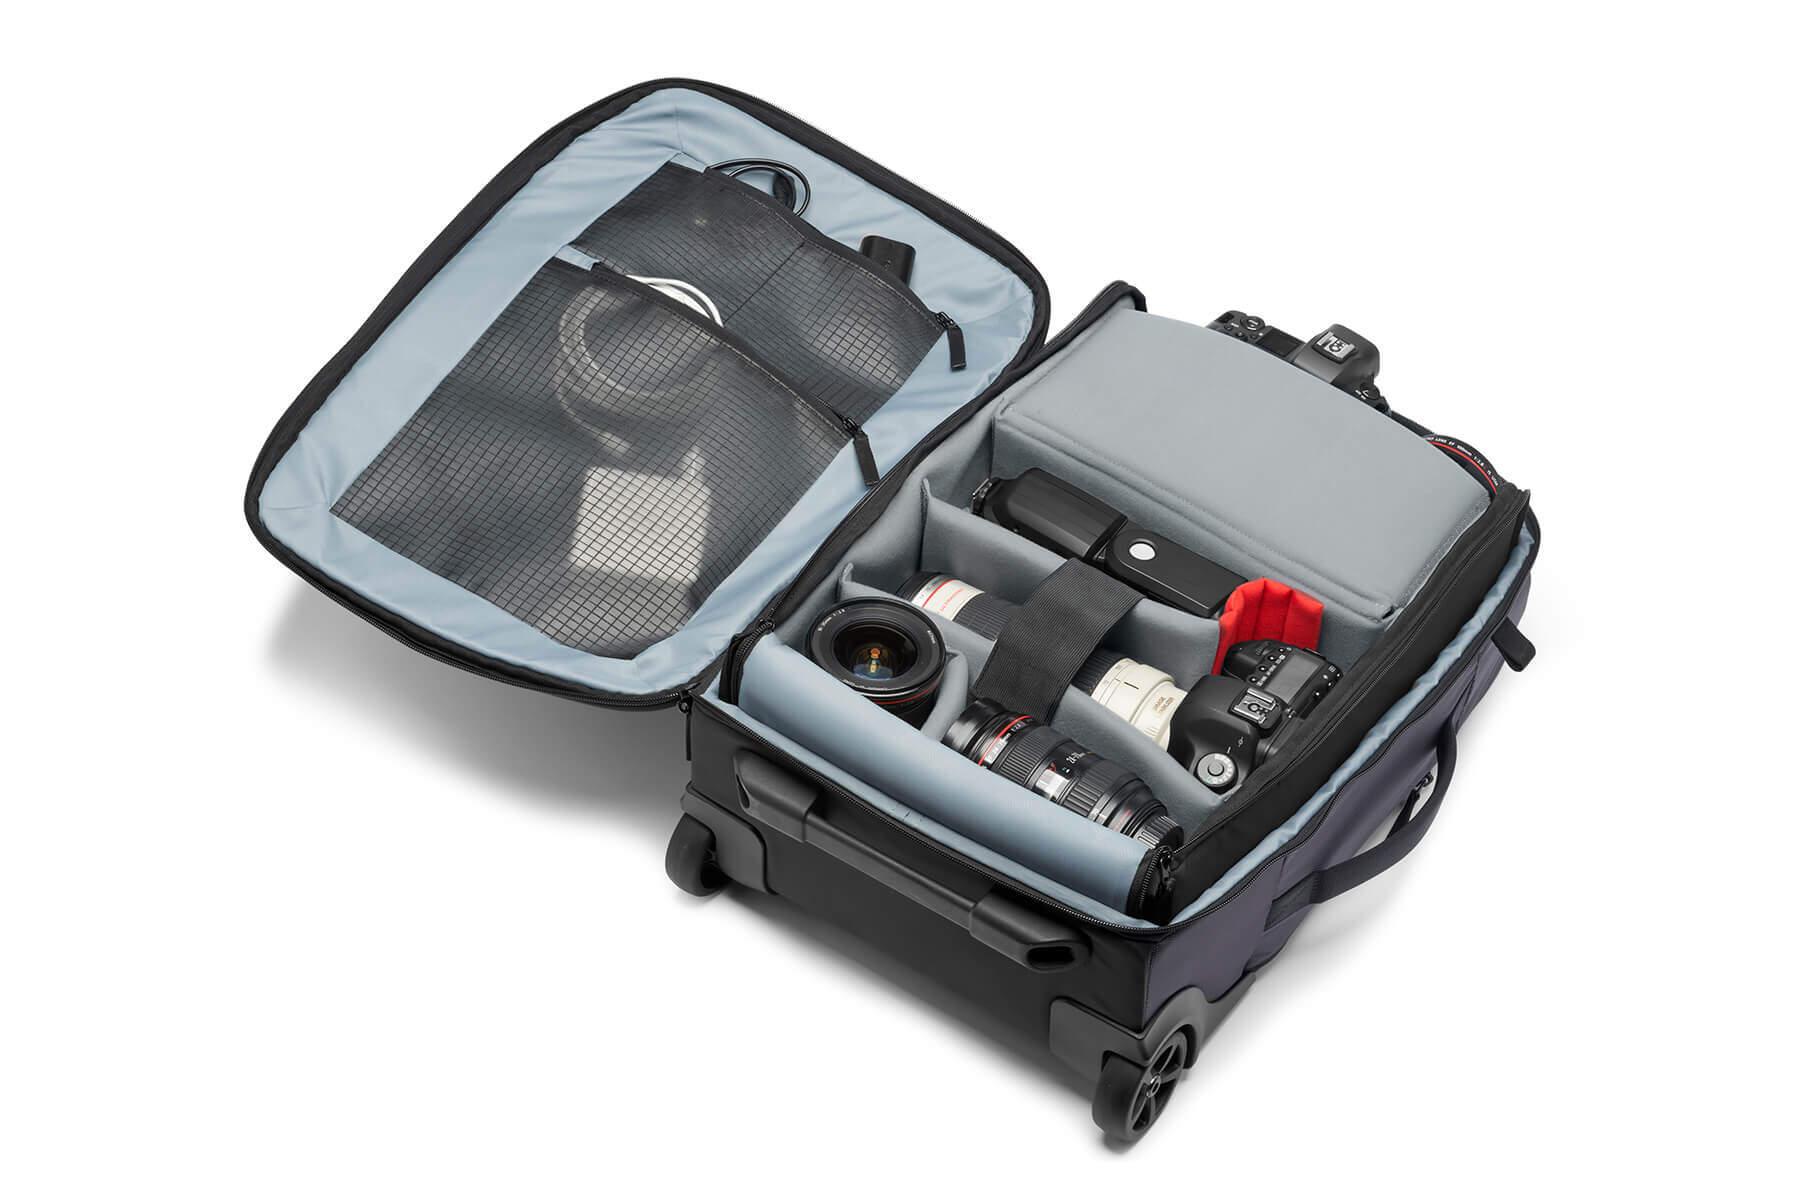 Manfrotto Runner-50 camera bag